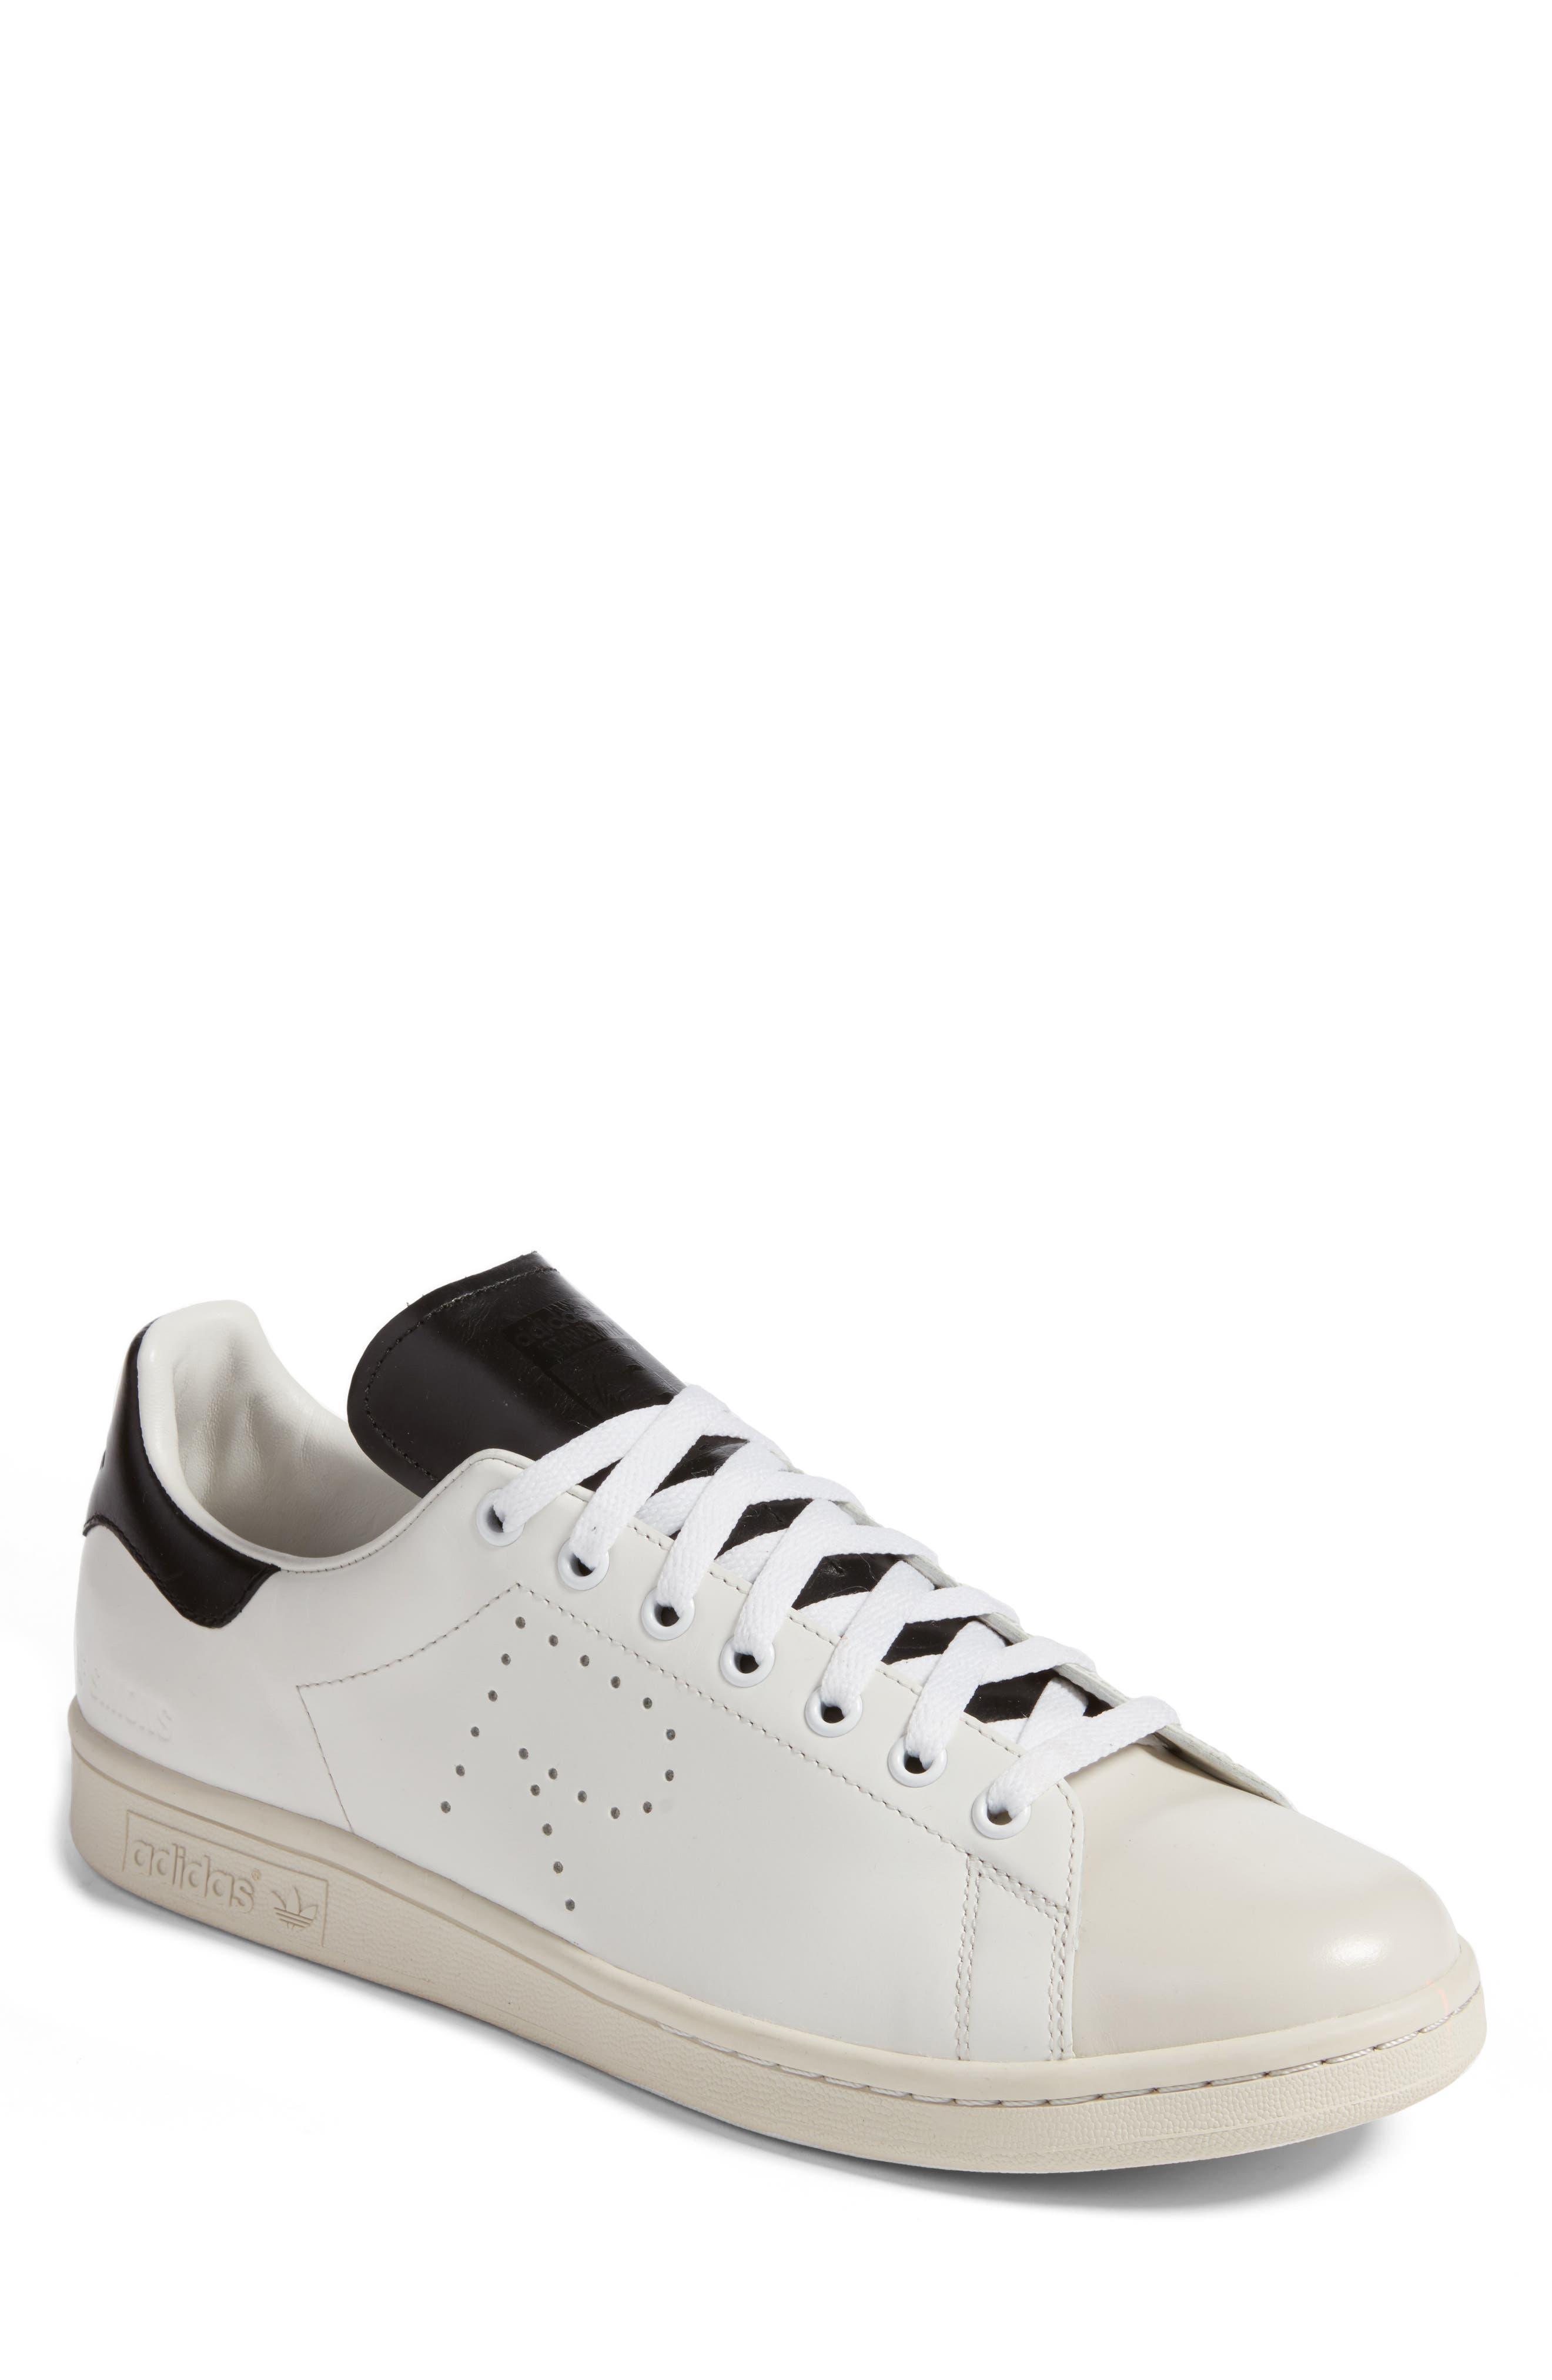 Main Image - adidas by Raf Simons Stan Smith Sneaker (Women)